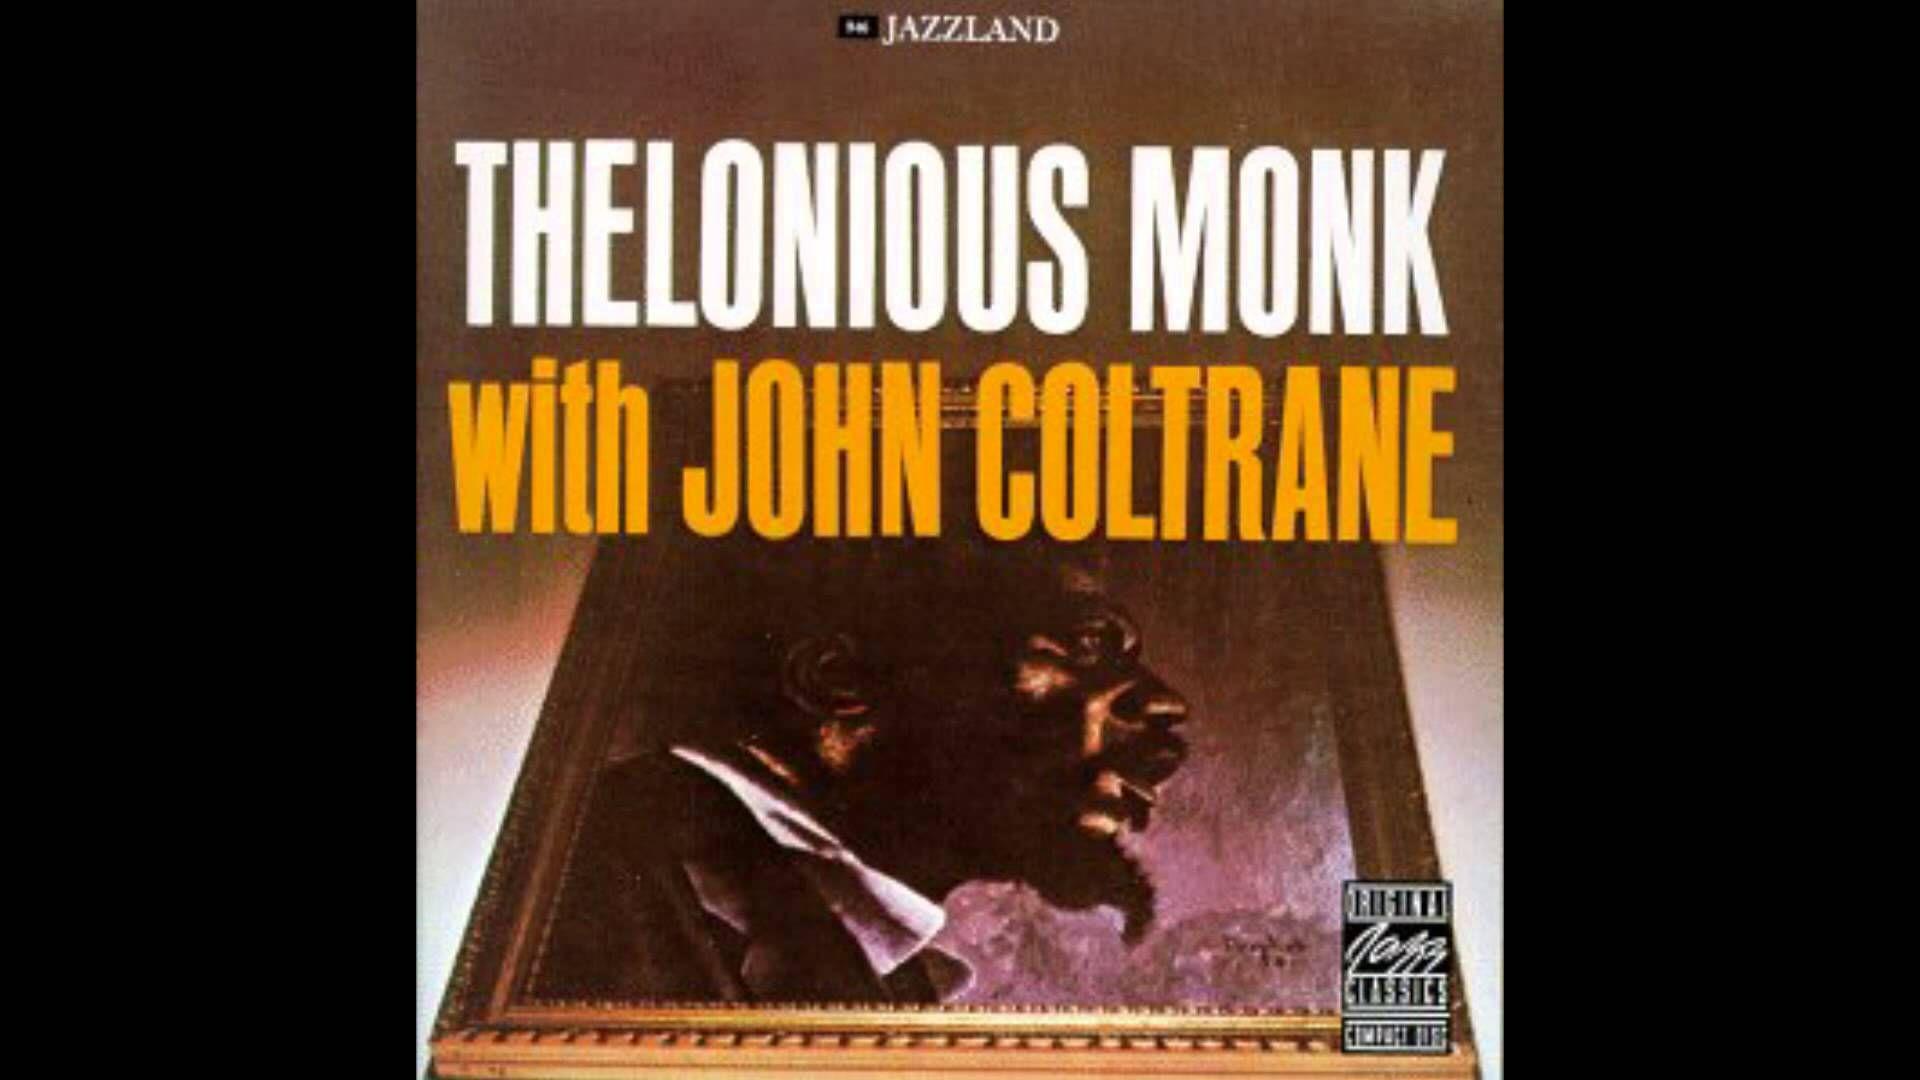 Thelonious Monk with John Coltrane (1957) [Full album